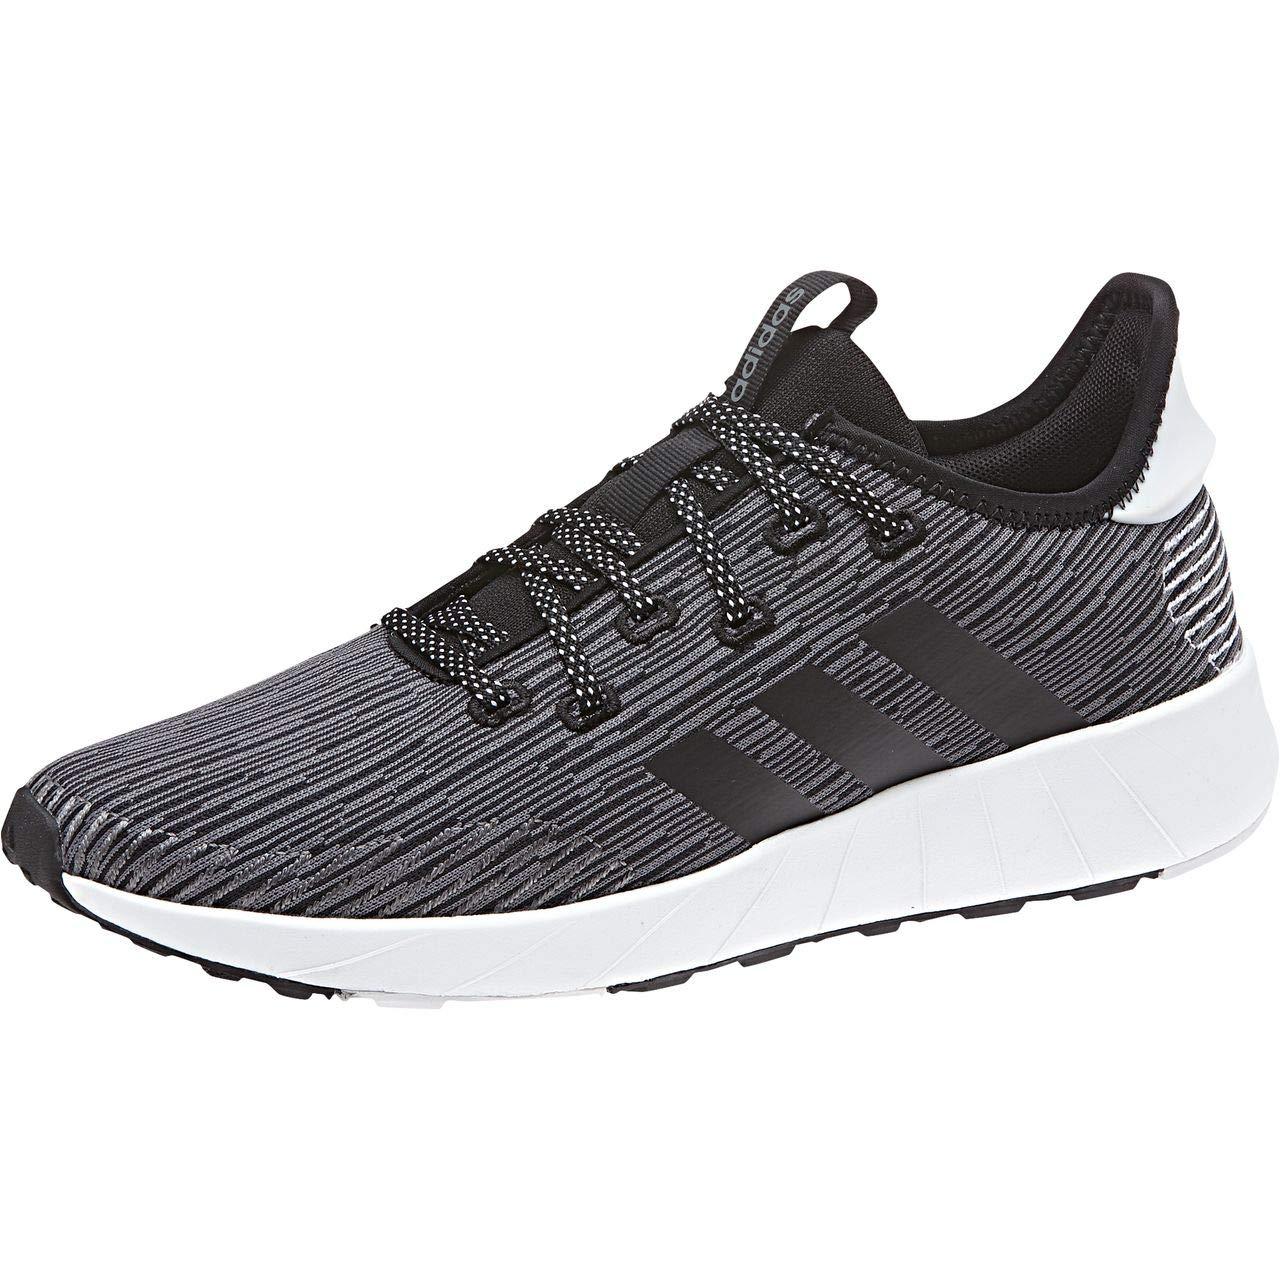 Adidas Damen Questar X BYD Fitnessschuhe, Grau Grau Grau (Carbon/Negbás/Gricua 000), 40 2/3 EU - 3490e7